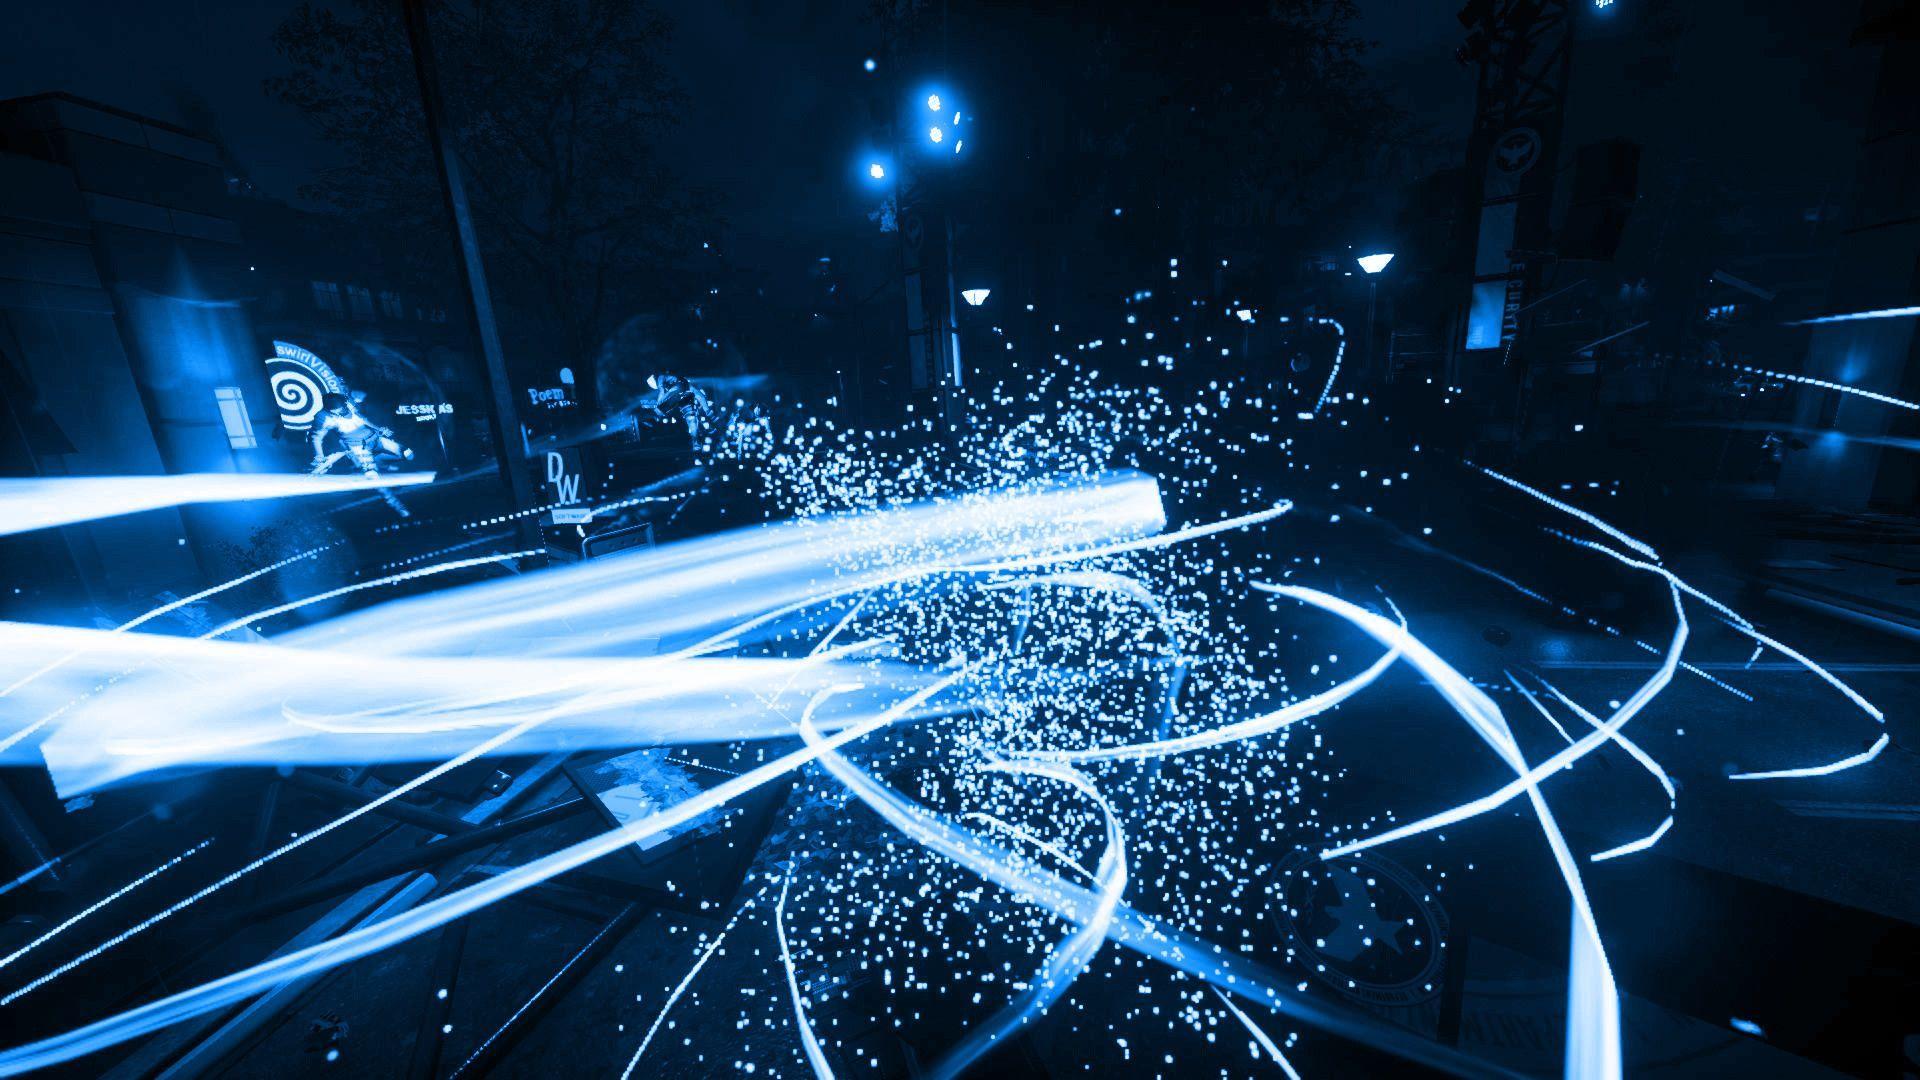 Gaming Neon Wallpapers Wallpaper Cave